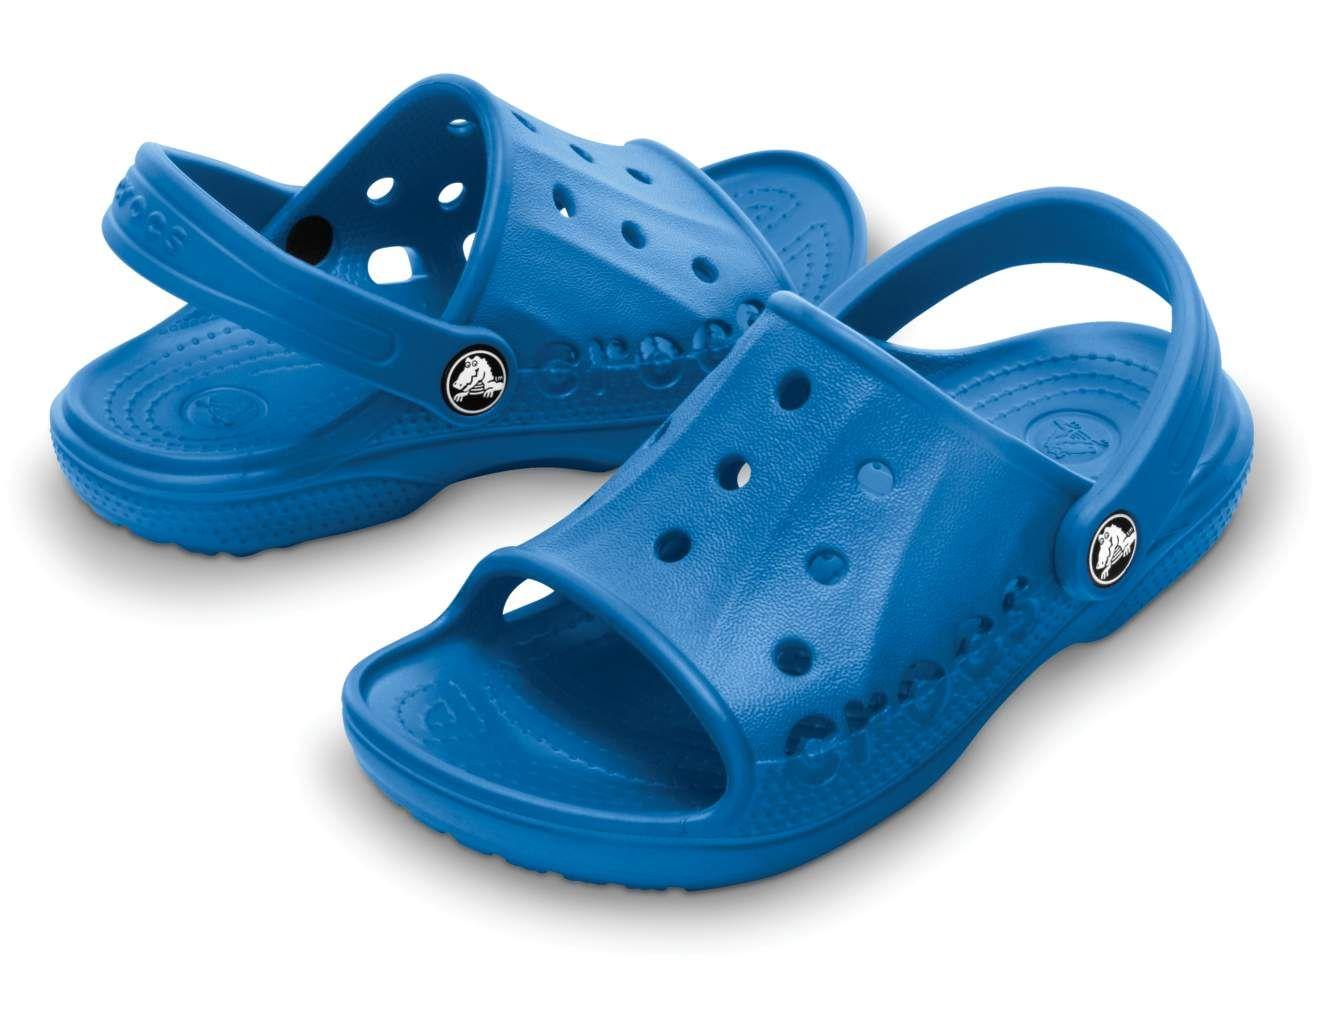 59f2d35c527 Crocs™ Baya Slide Kids